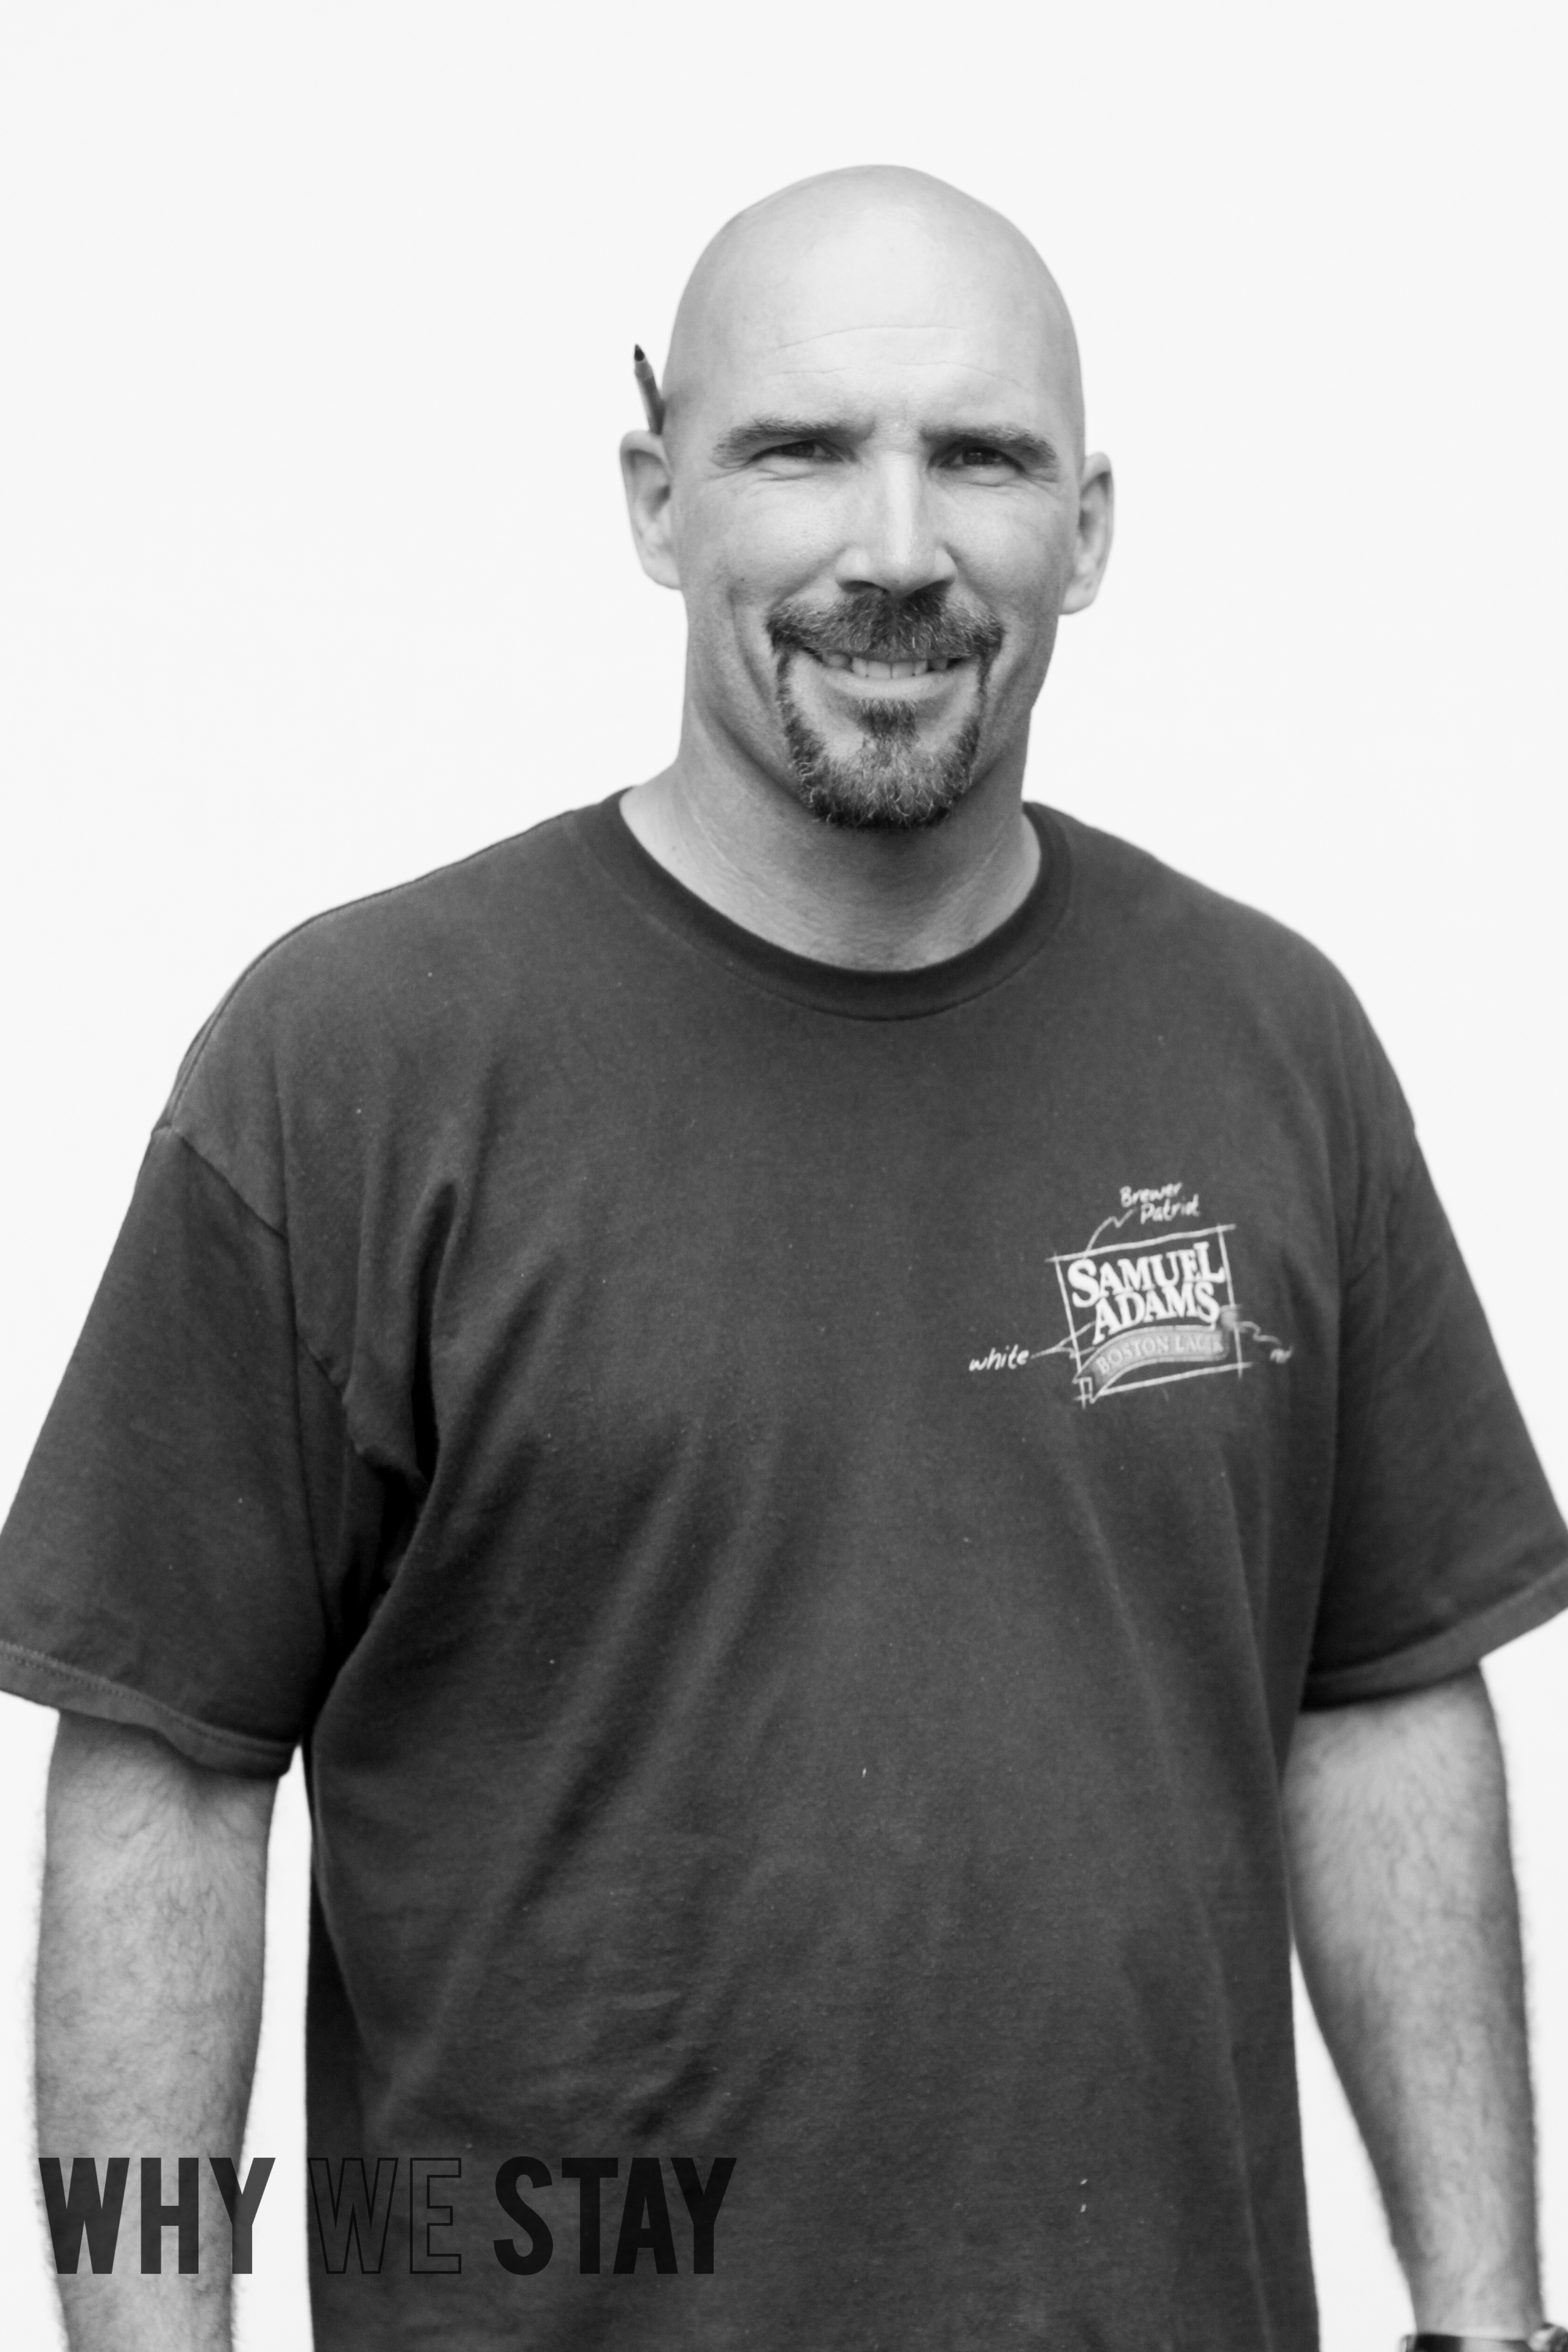 Scott Durkee